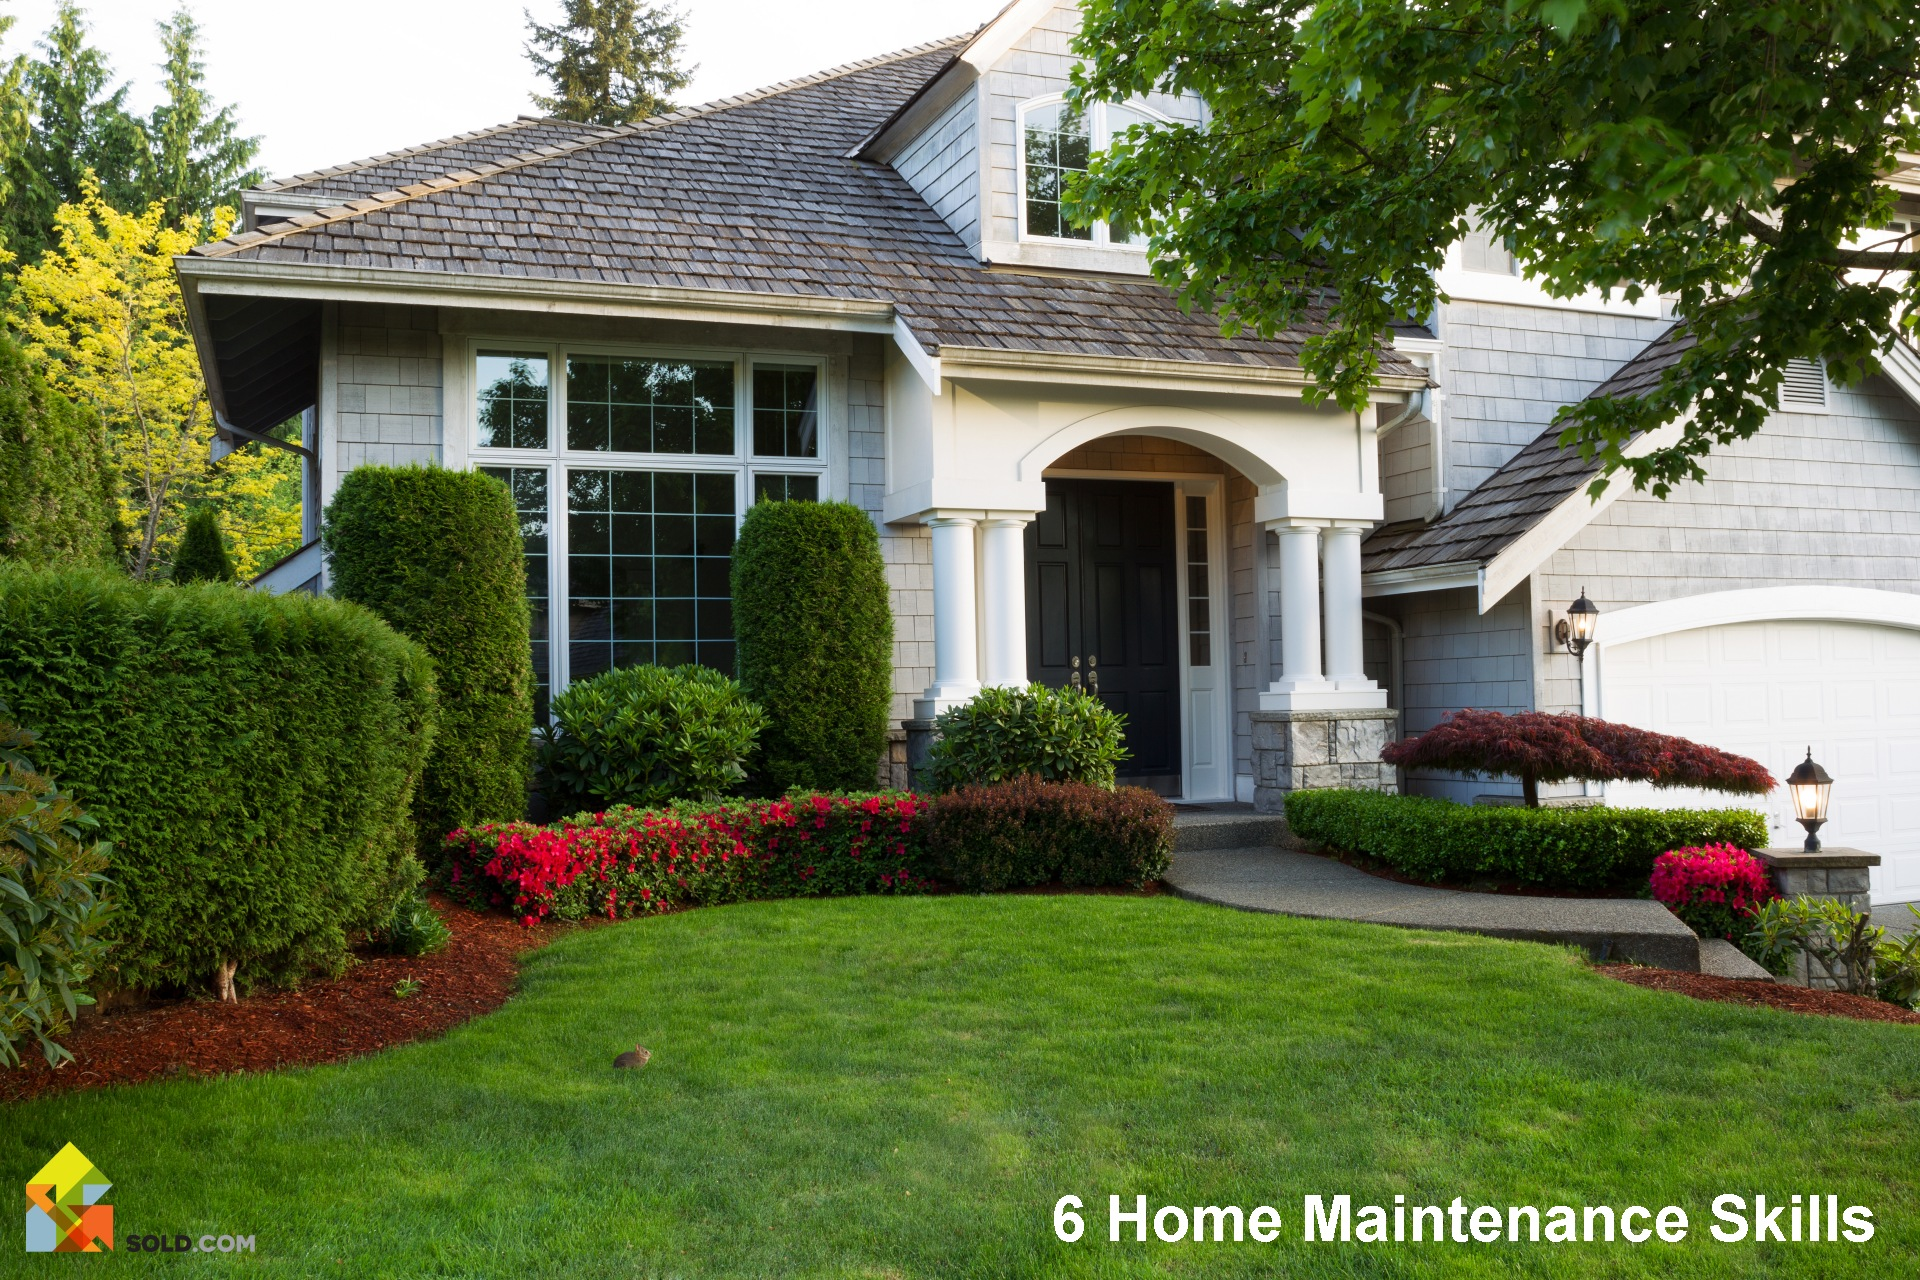 6 Home Maintenance Skills Every Homeowner Should Master